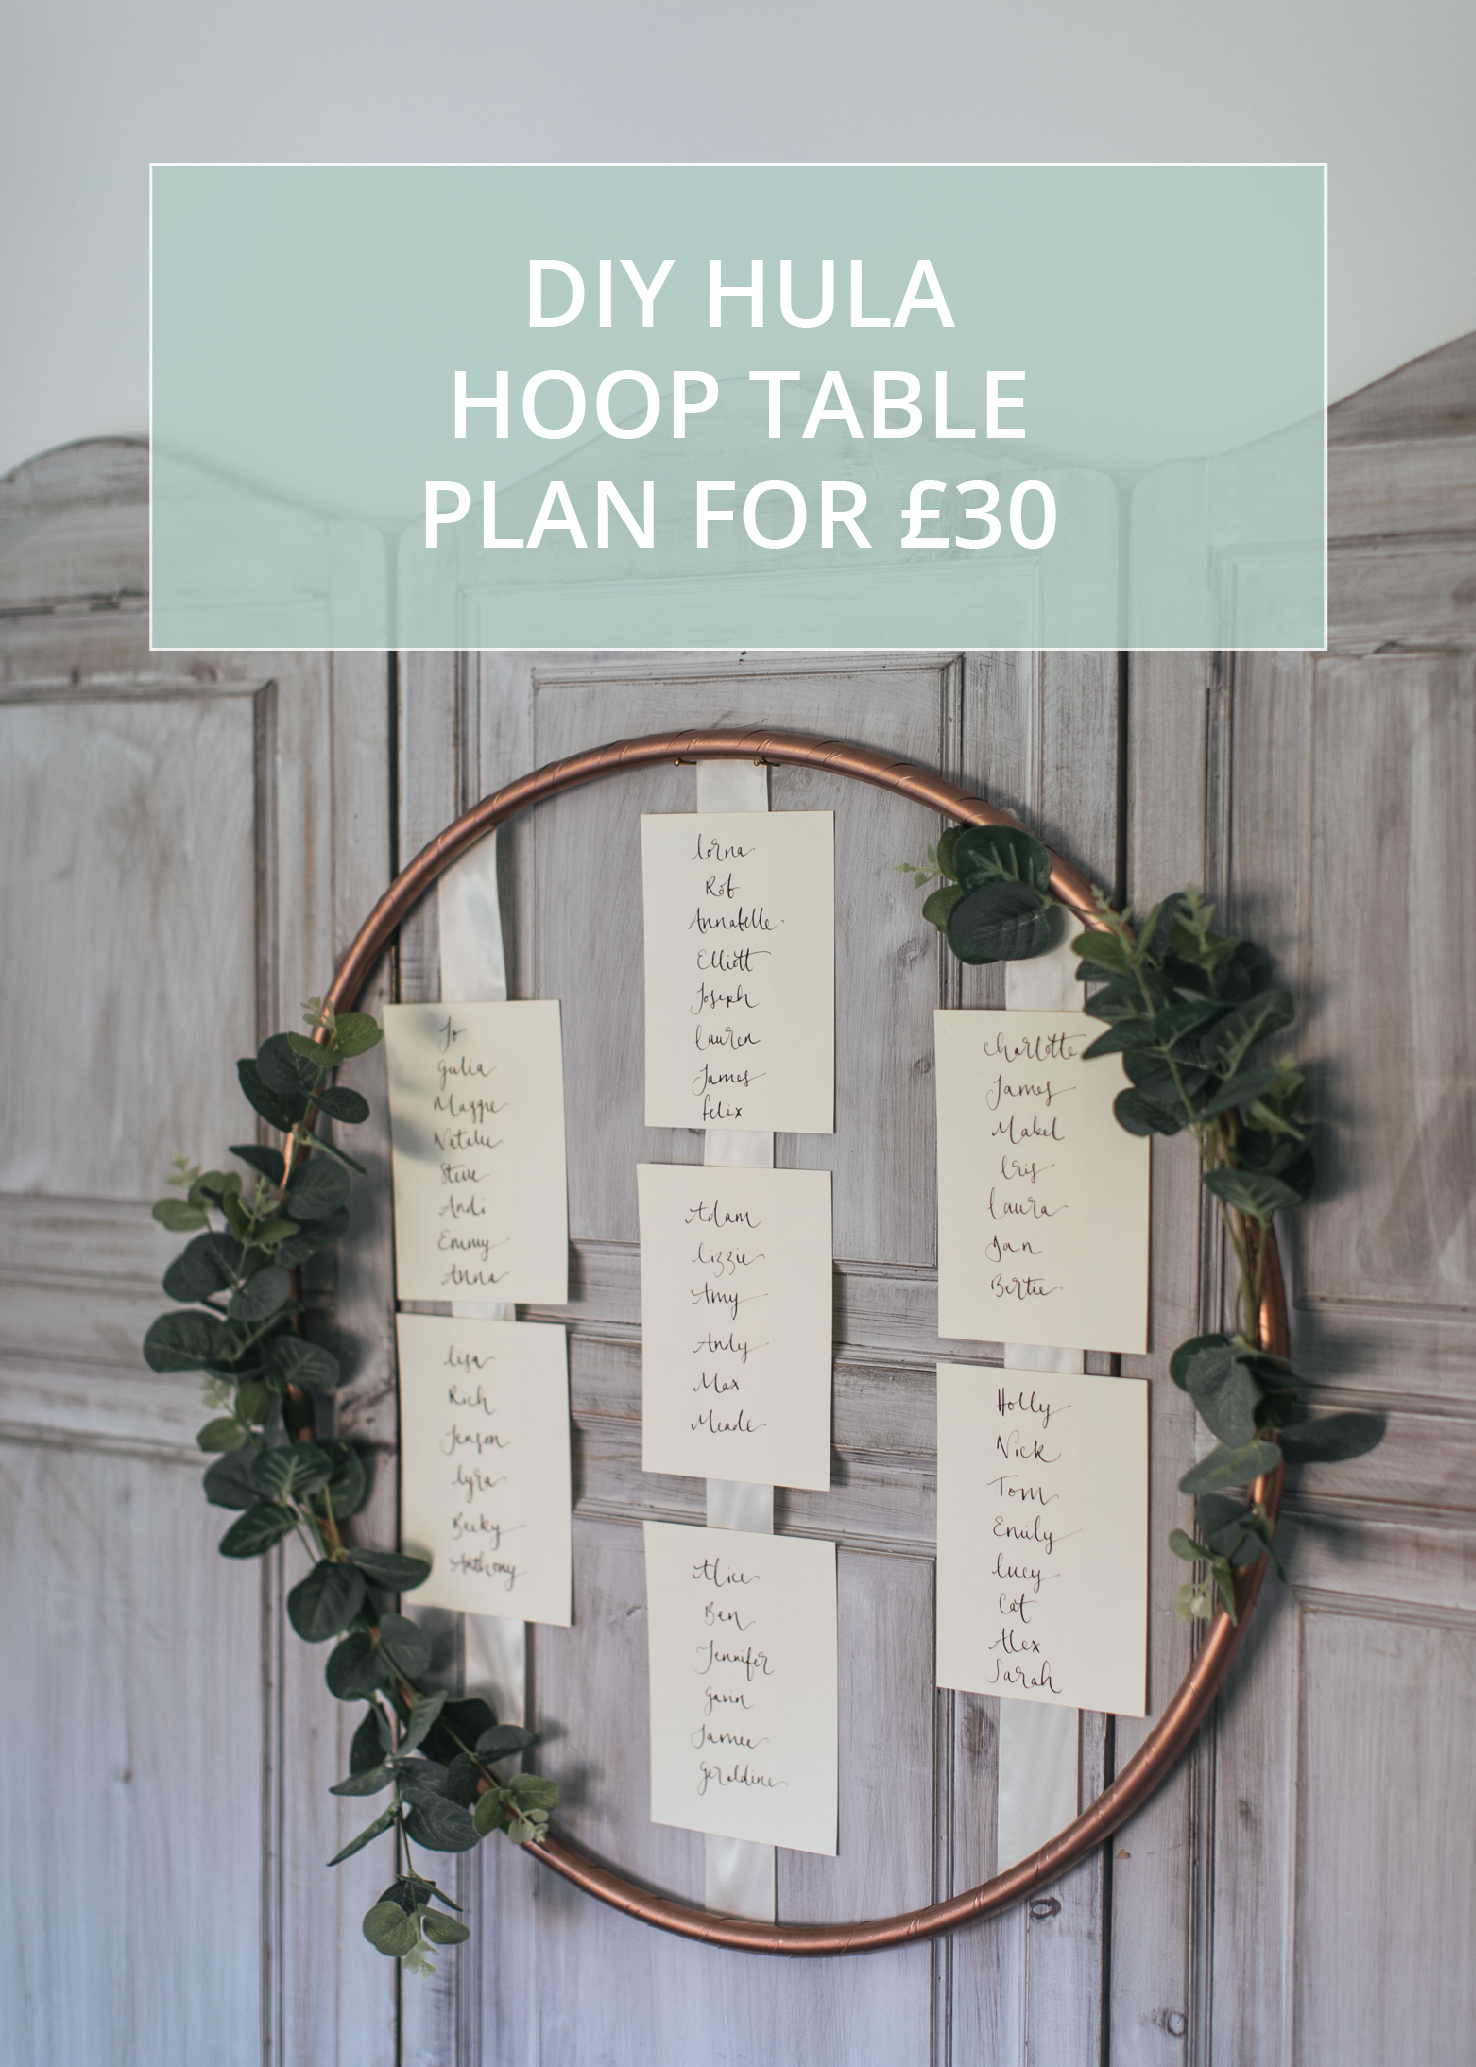 Hula Hoop Table Plan Diy Make Your Own For 163 30